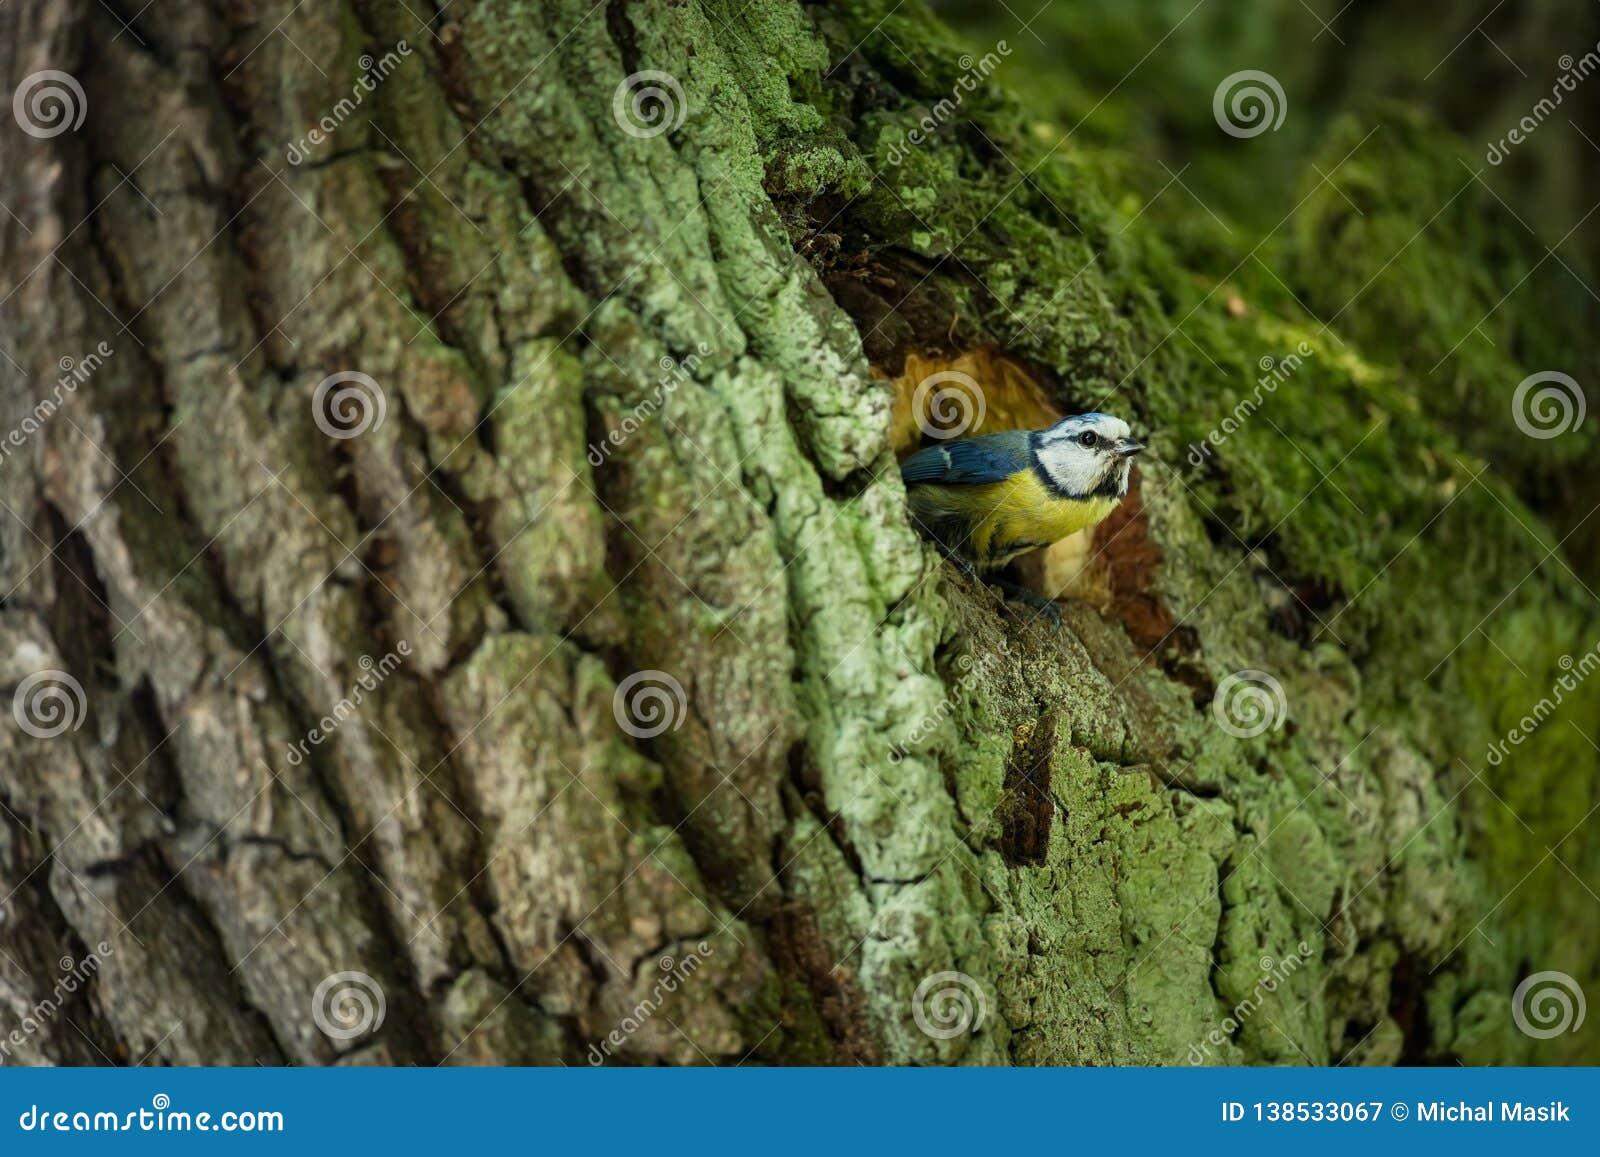 Cyanistes caeruleus 野生生物 E 美好的照片 自由本质 从鸟生活 春天 蓝色鸟